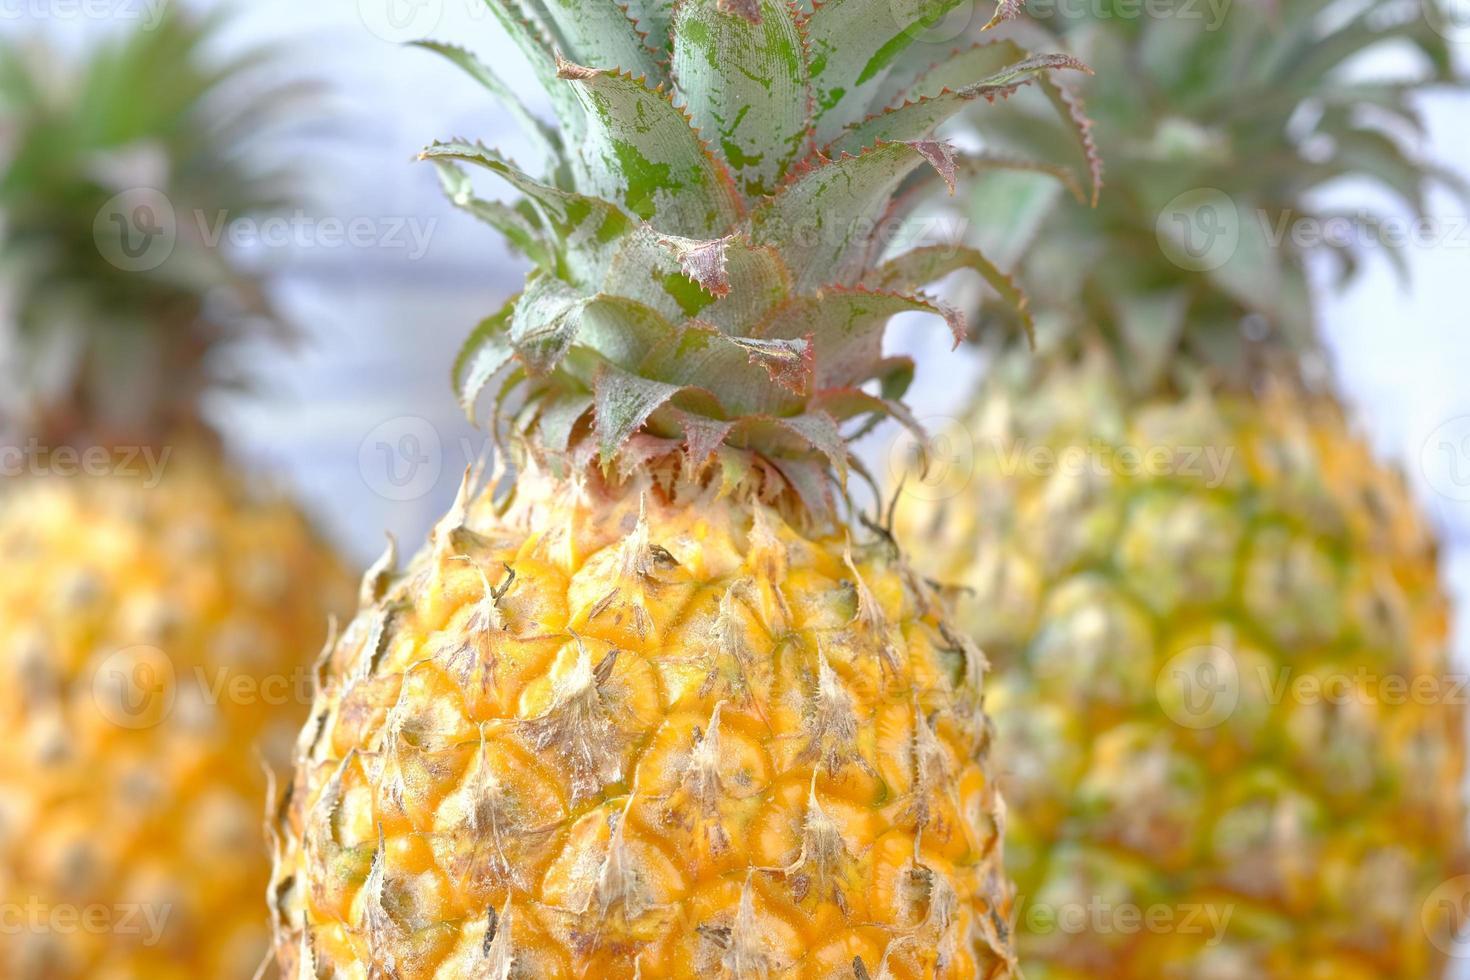 gros plan d'ananas frais photo